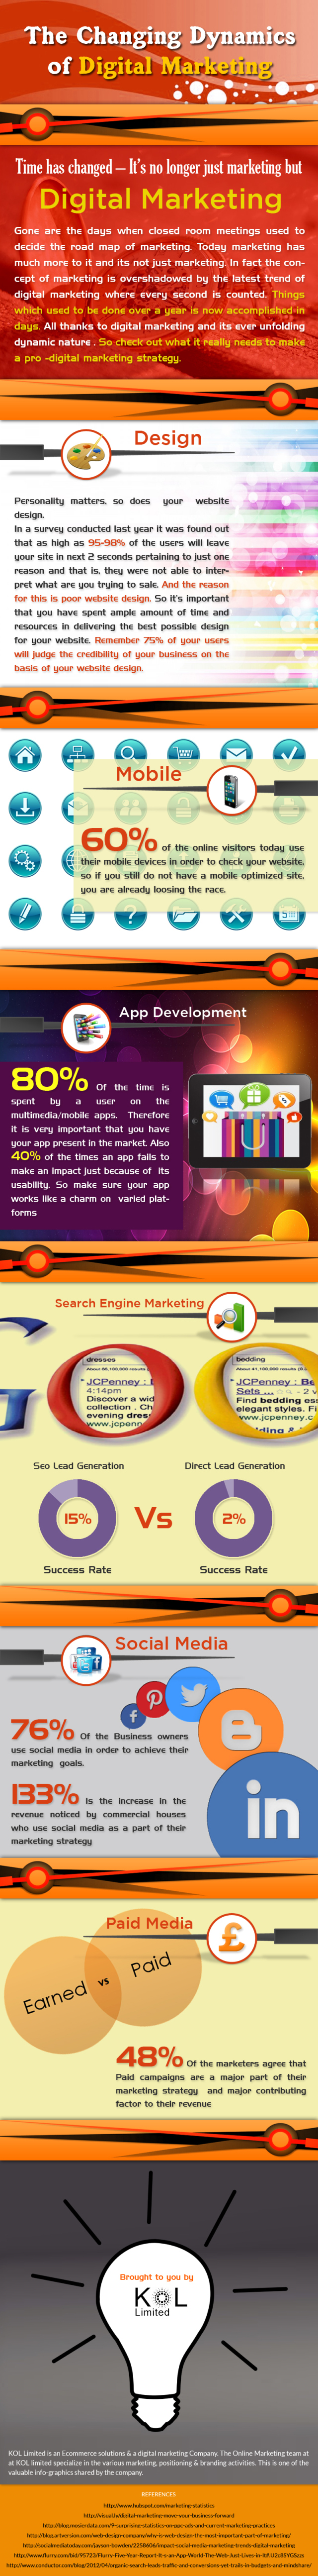 The changing dynamics of digital marketing #infografia #infographic #marketing